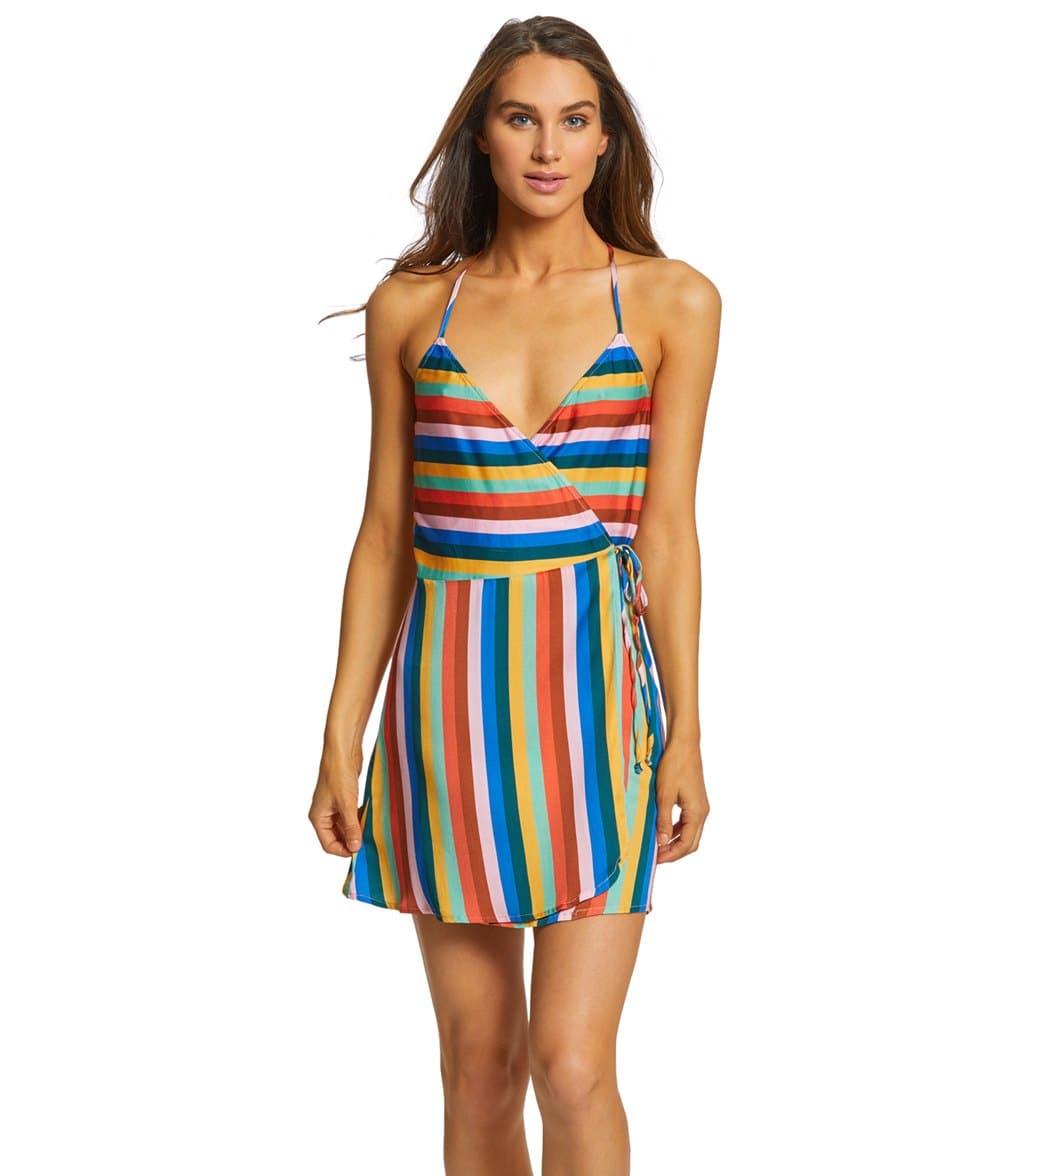 c46e38e353b25 Bikini Lab Palm Springs Wrap Dress at SwimOutlet.com - Free Shipping